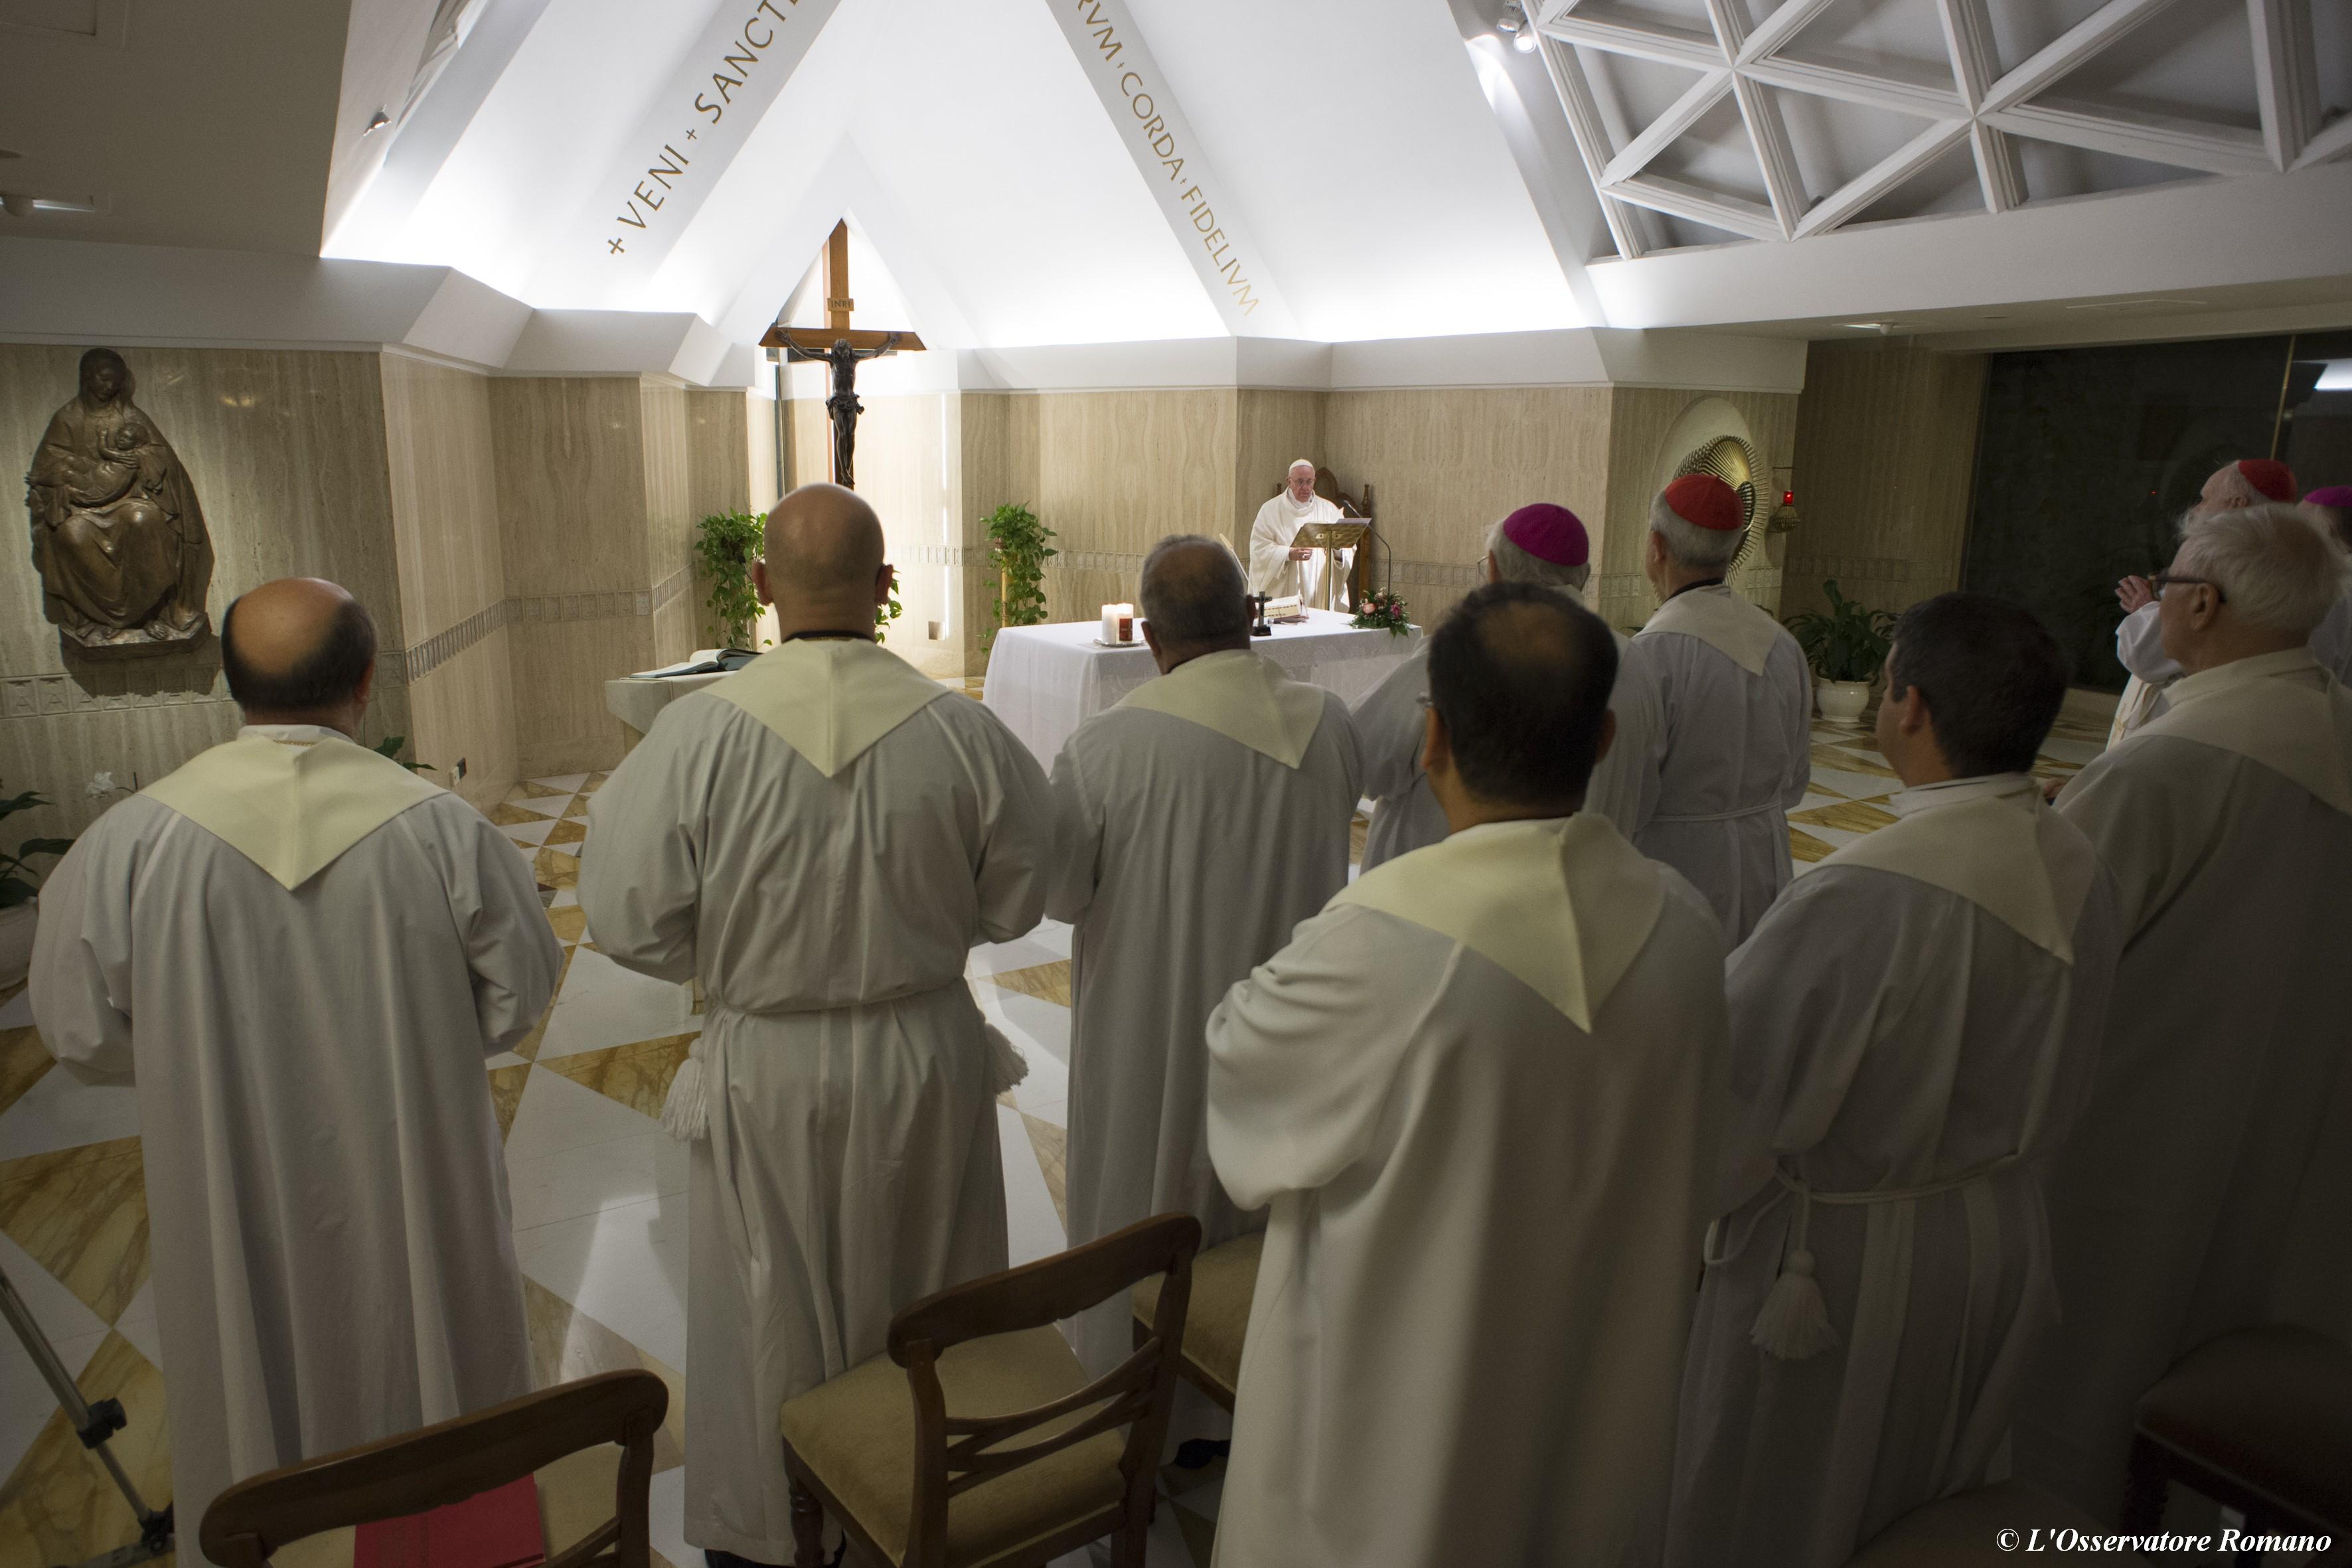 Morning Mass in the Domus Sanctae Marthae